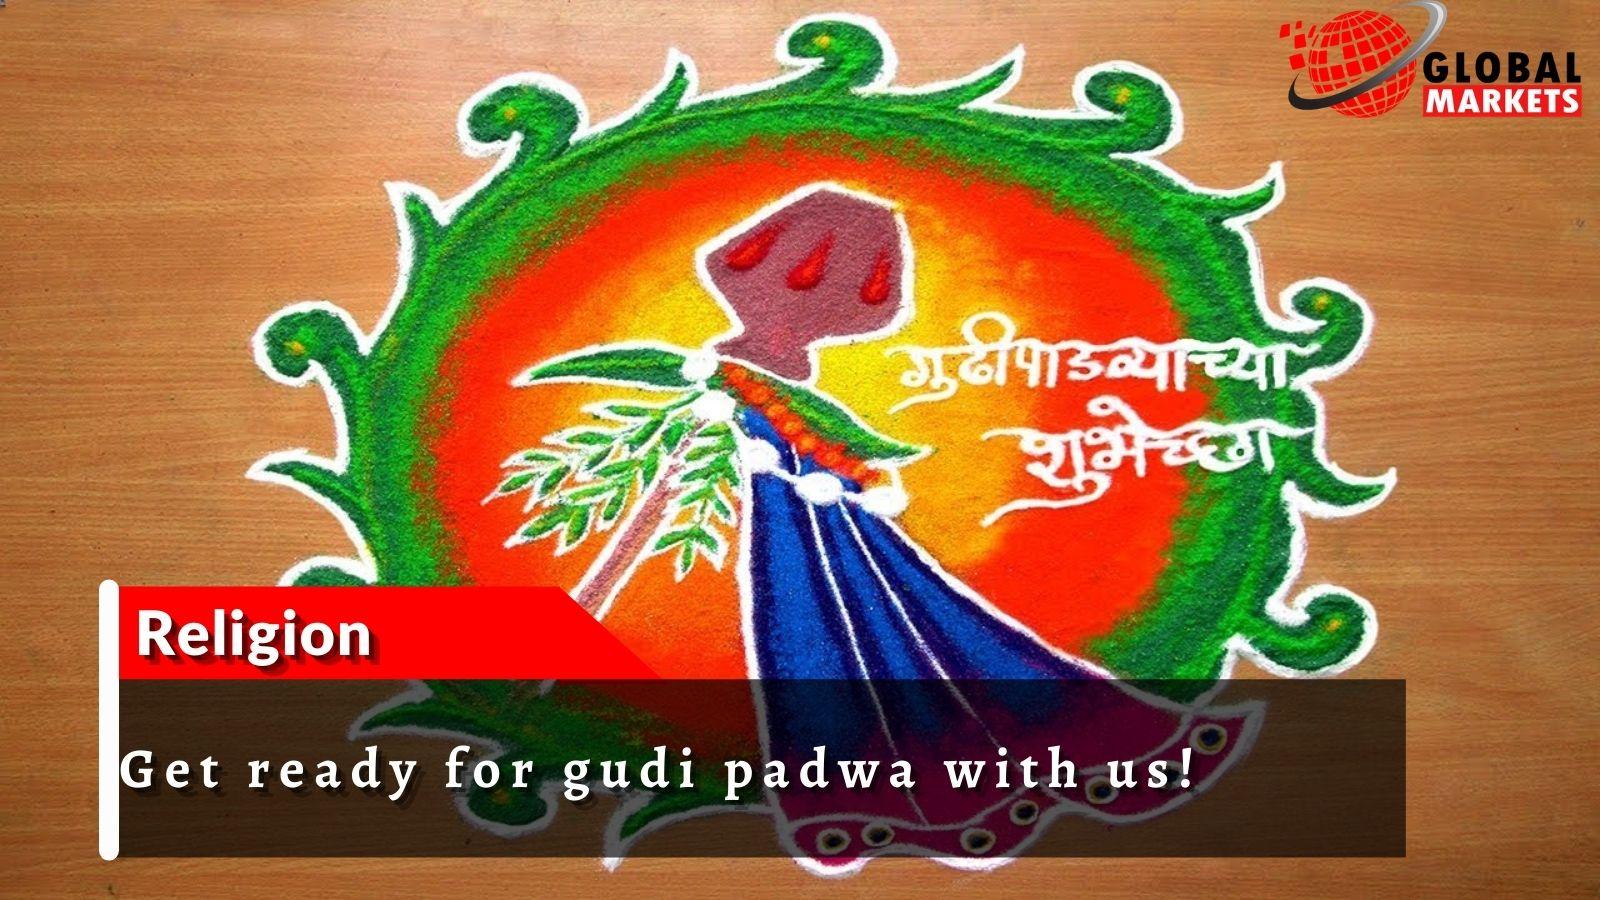 Gudi Padwa will be celebrated by natives of Maharashtra and Goa